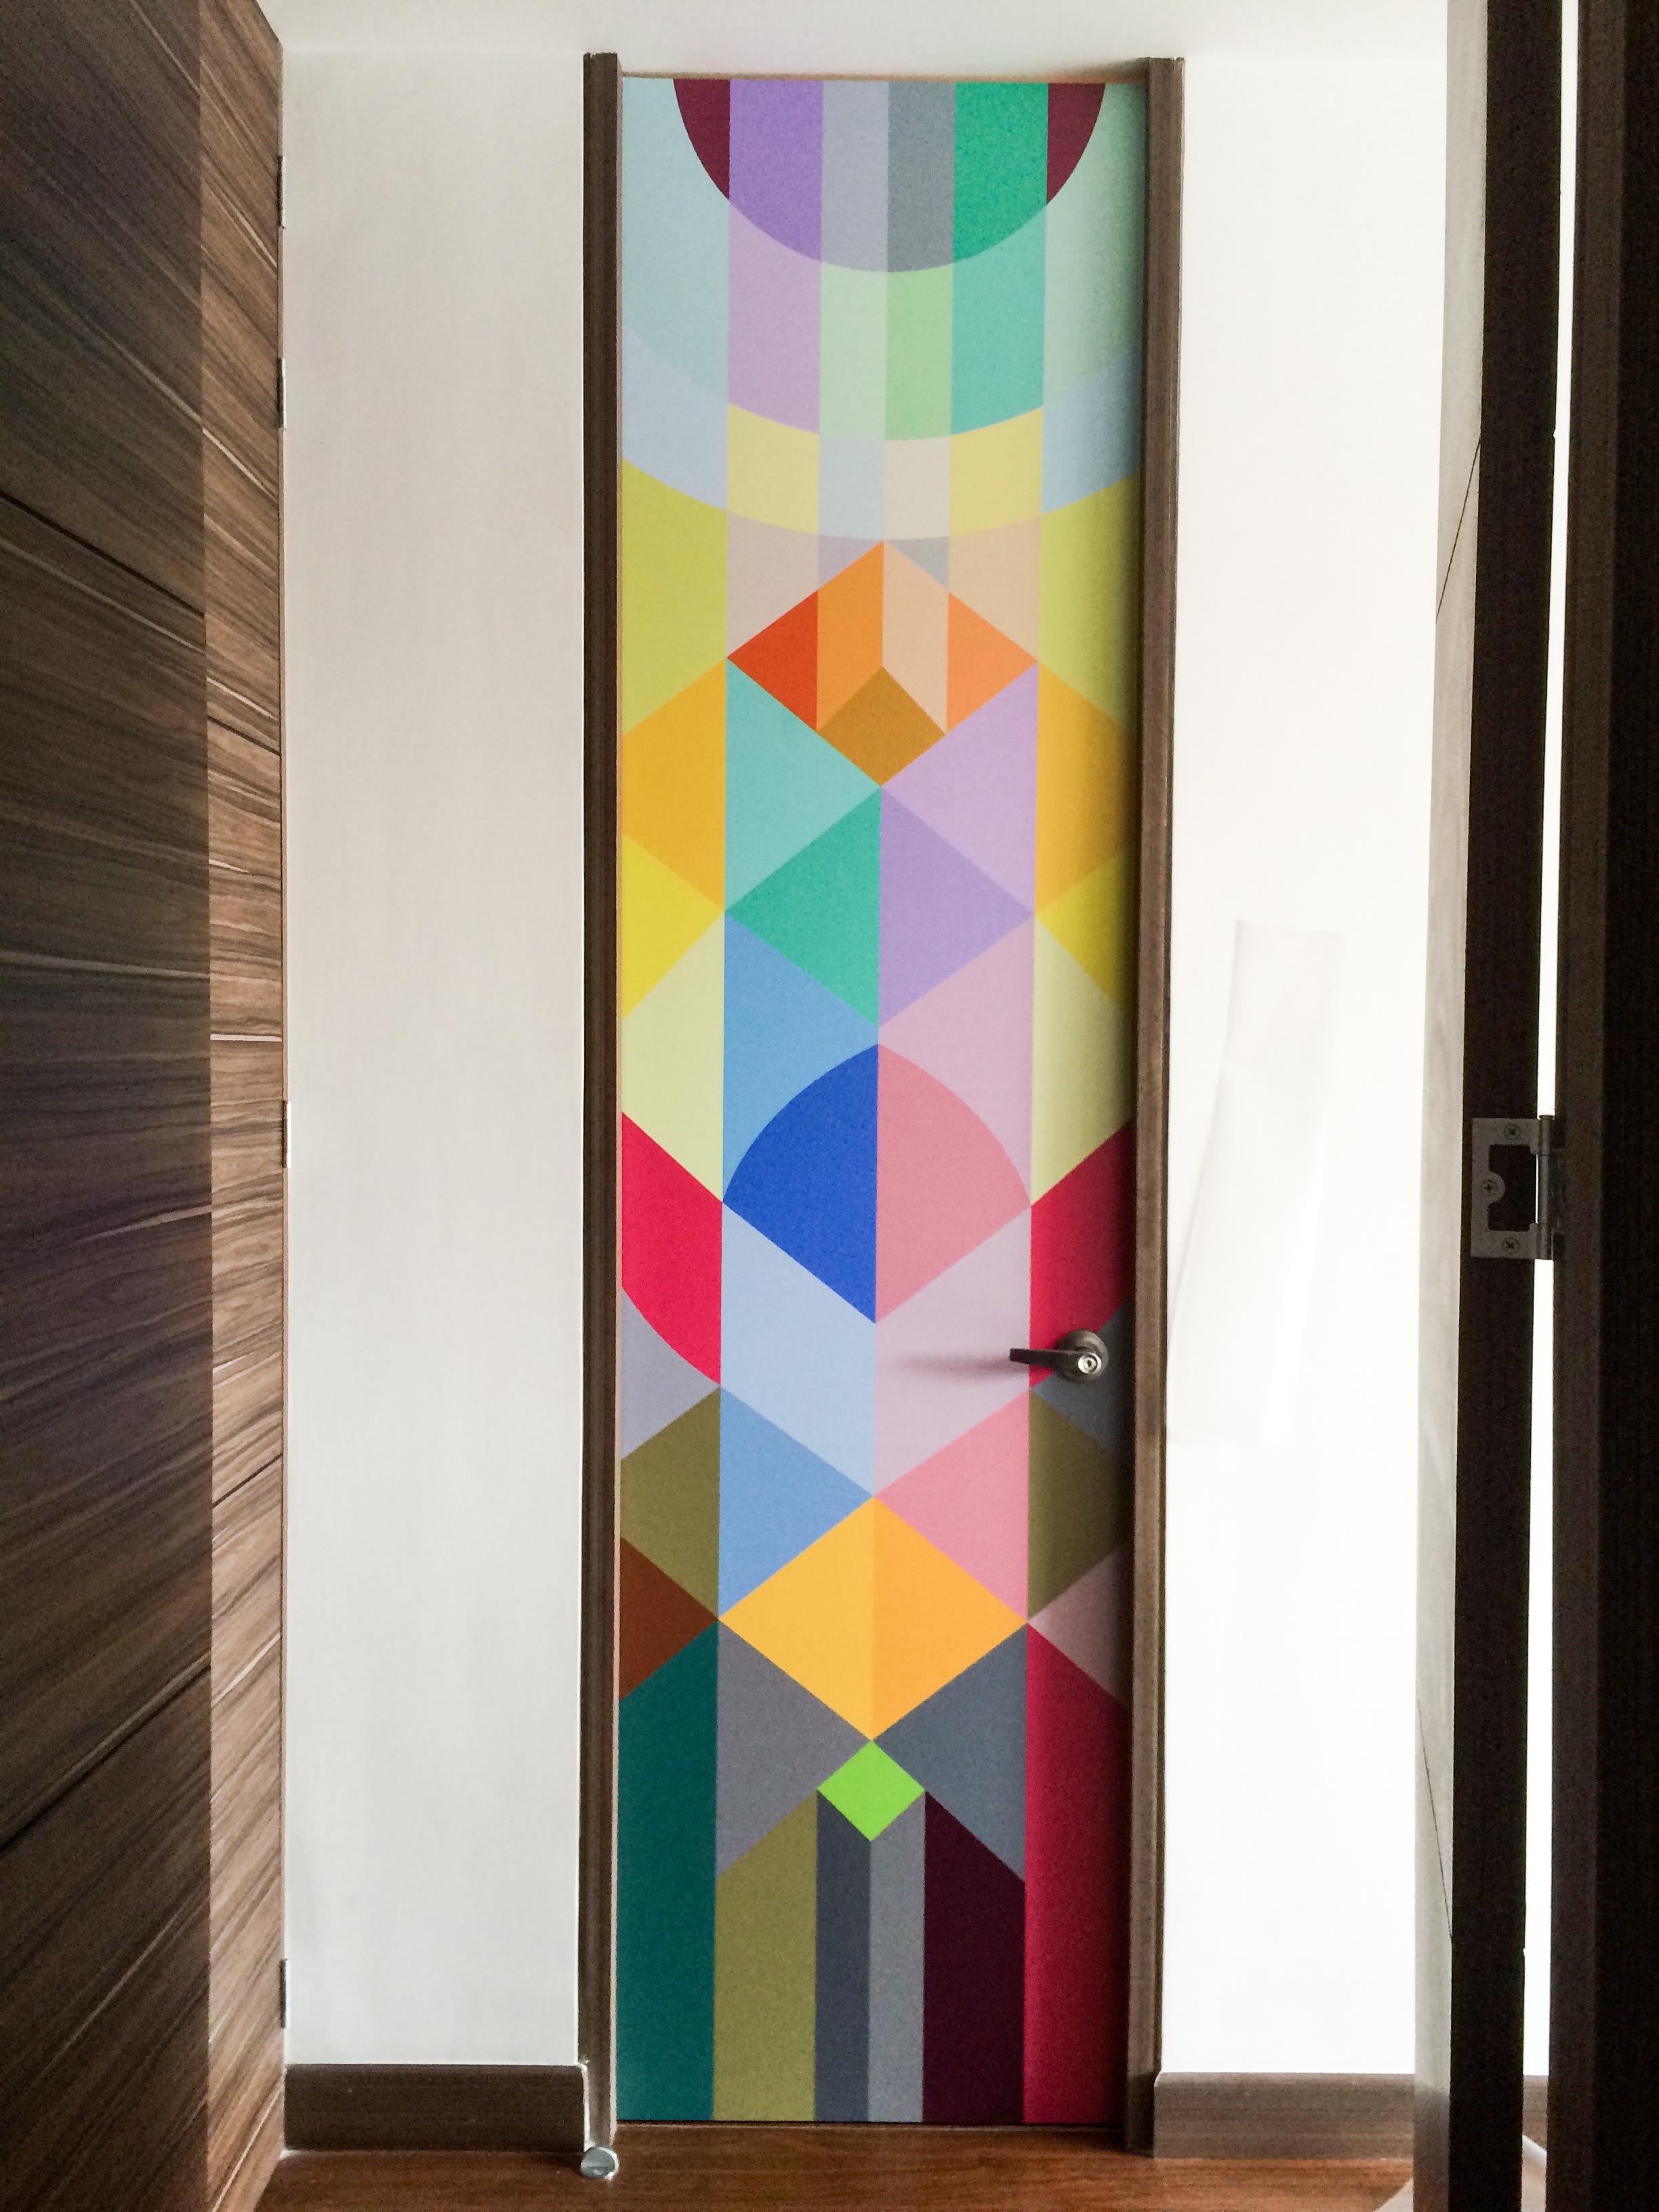 Bathroom Vynil Art Graphic Pattern Decor